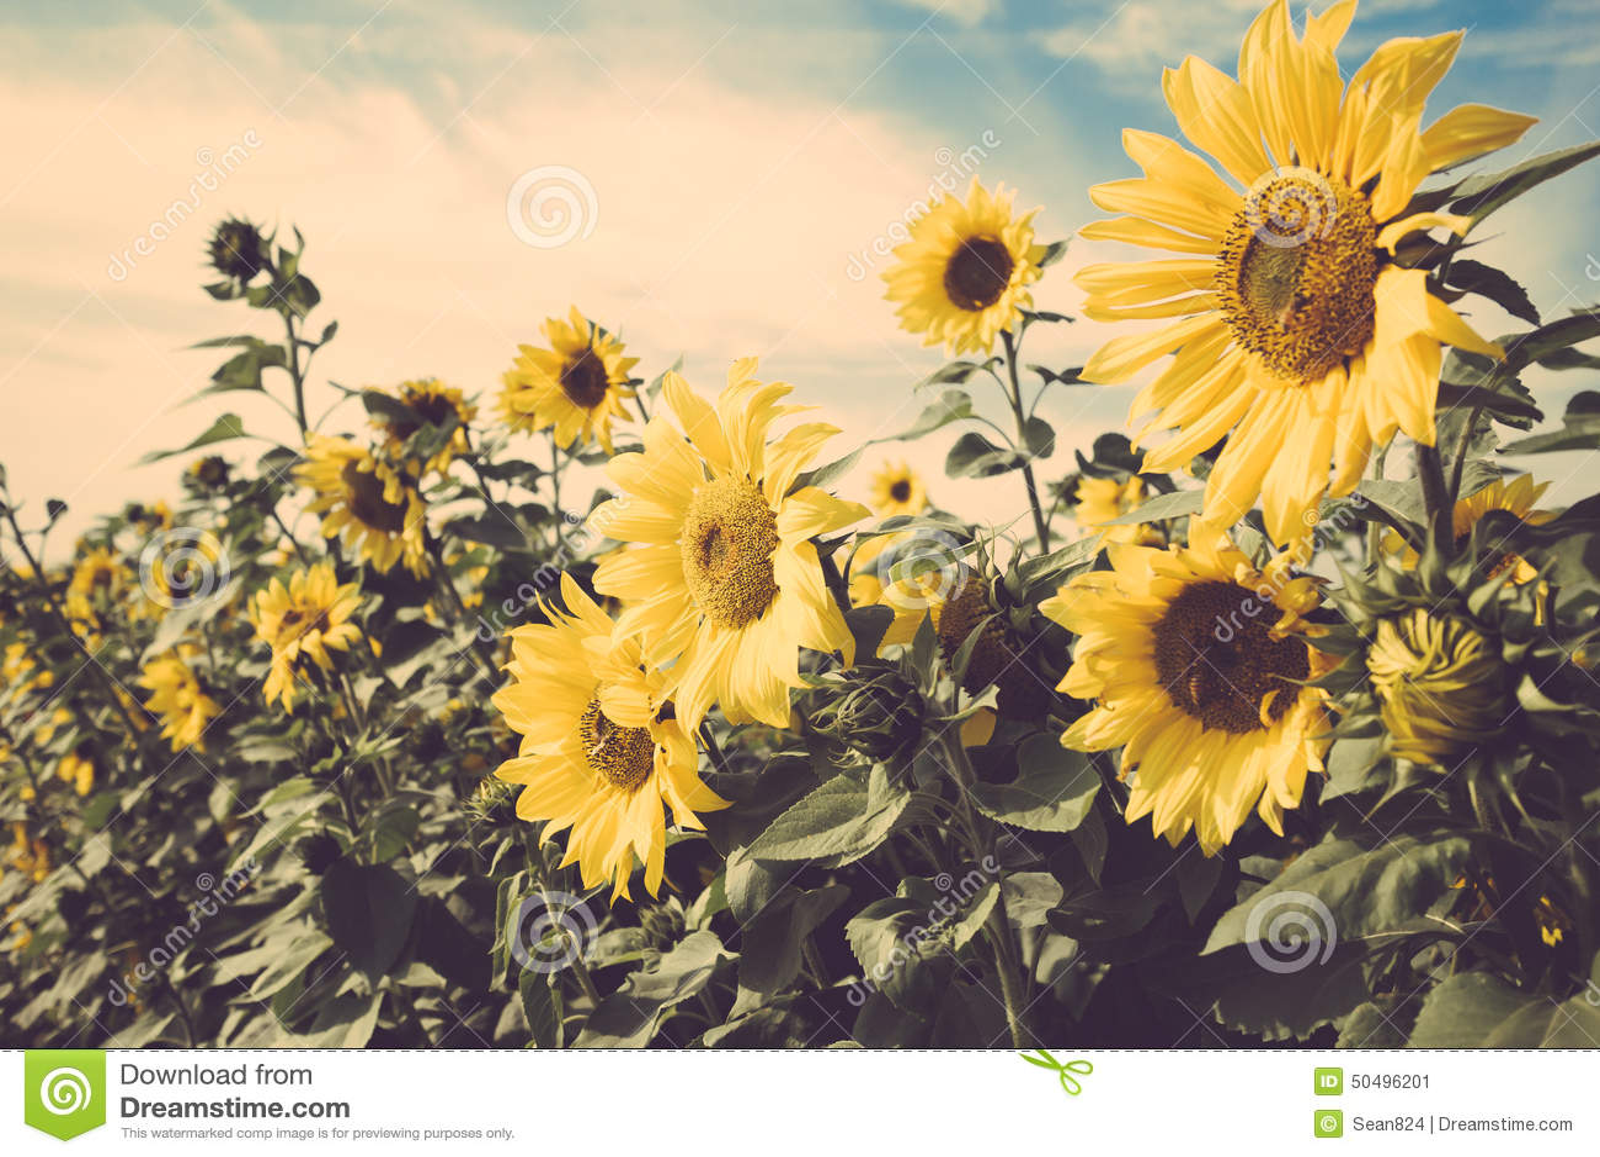 Sunflower Wallpaper Sunflower Wallpaper Vintage